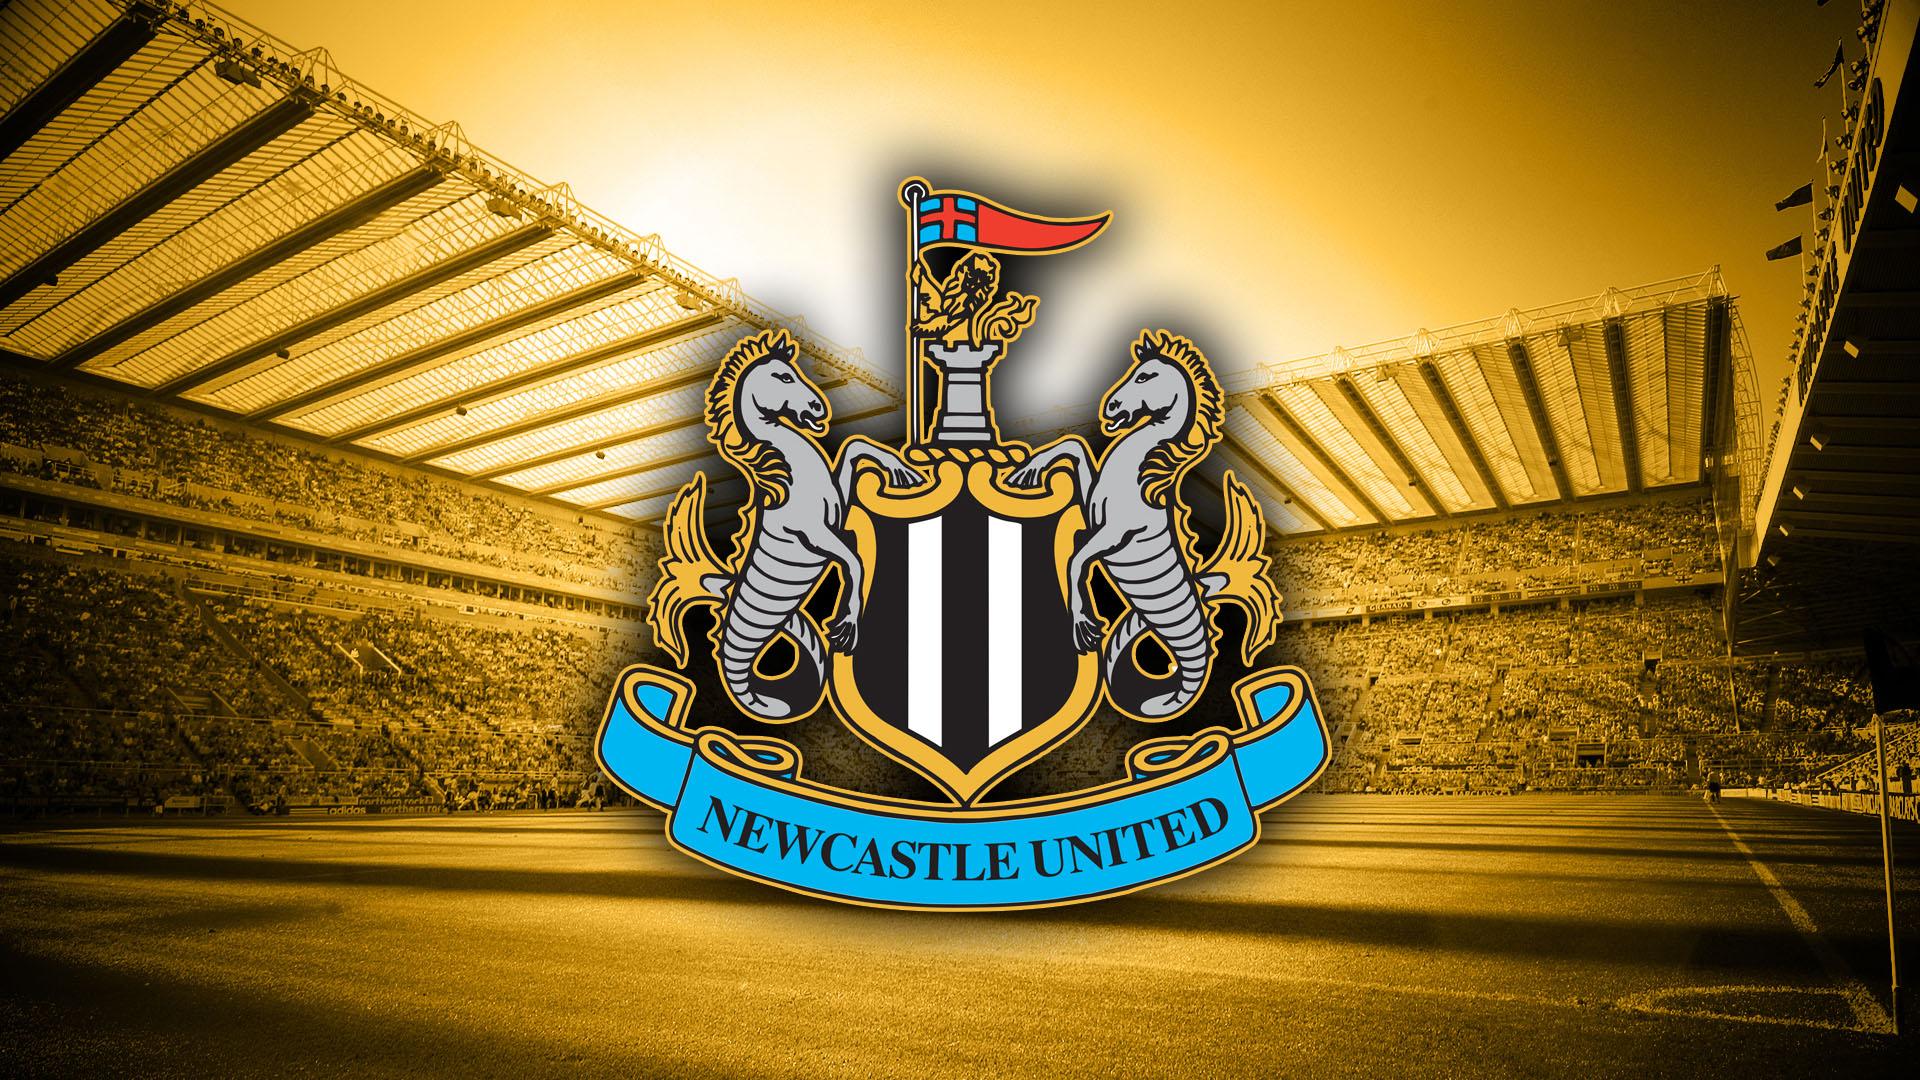 Best 40 Newcastle United Wallpaper on HipWallpaper Newcastle 1920x1080